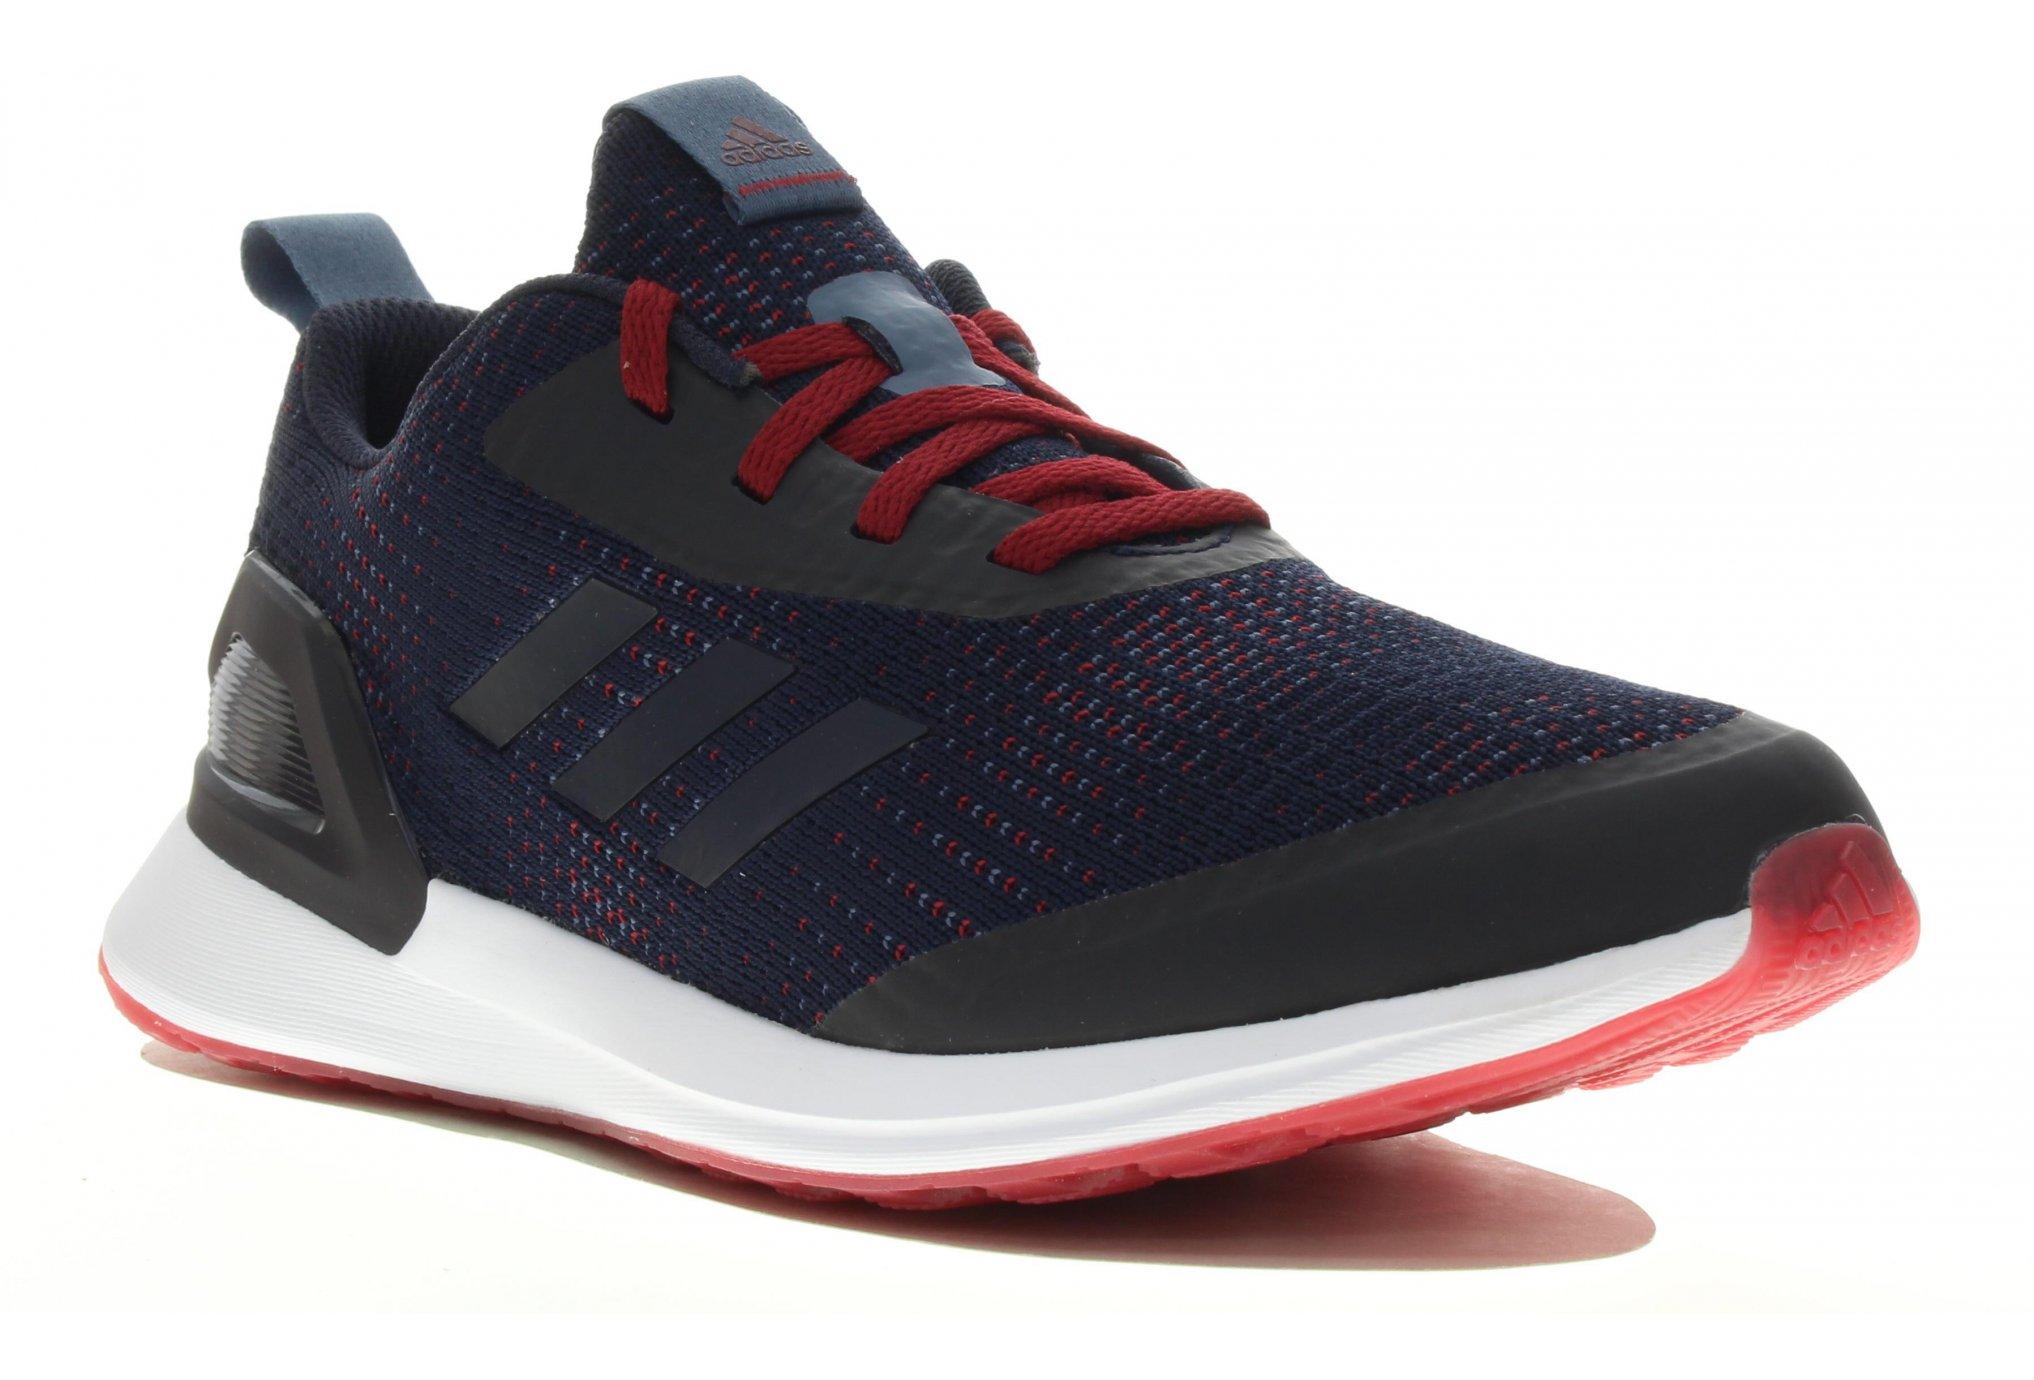 adidas RapidaRun X Knit Junior Chaussures homme